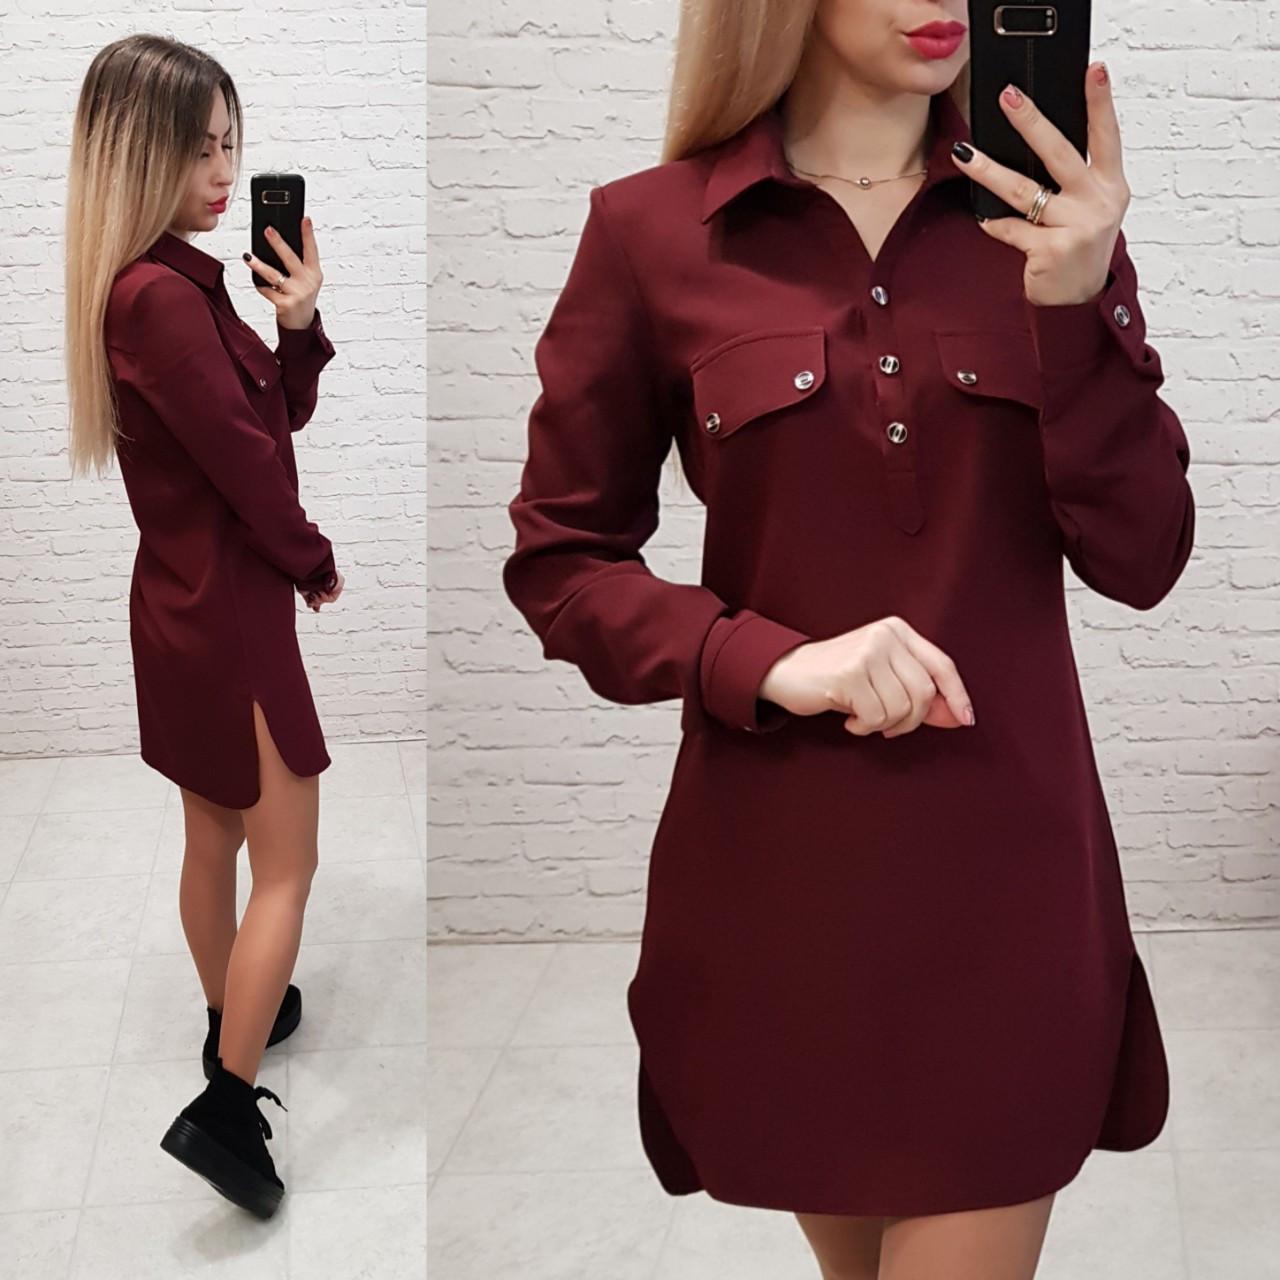 Платье - рубашка арт. 825 бордо / марсала / вишня